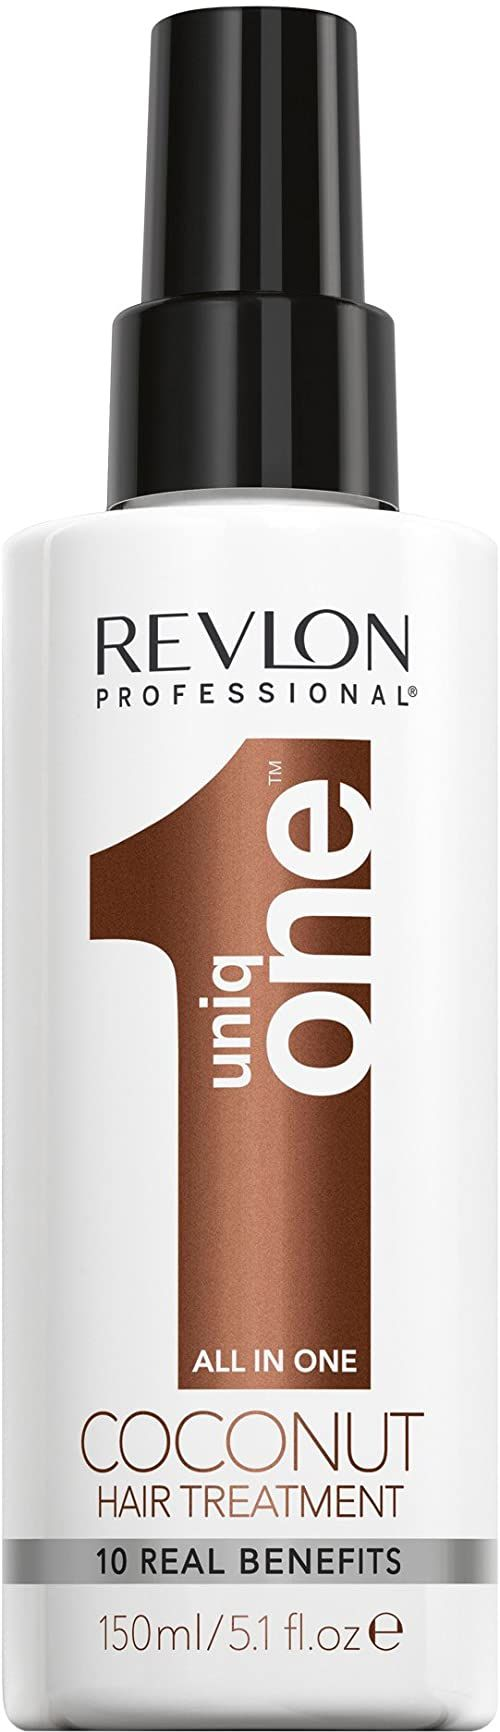 Revlon Professional Uniqone Hair Treatment Coconut, 150 ml